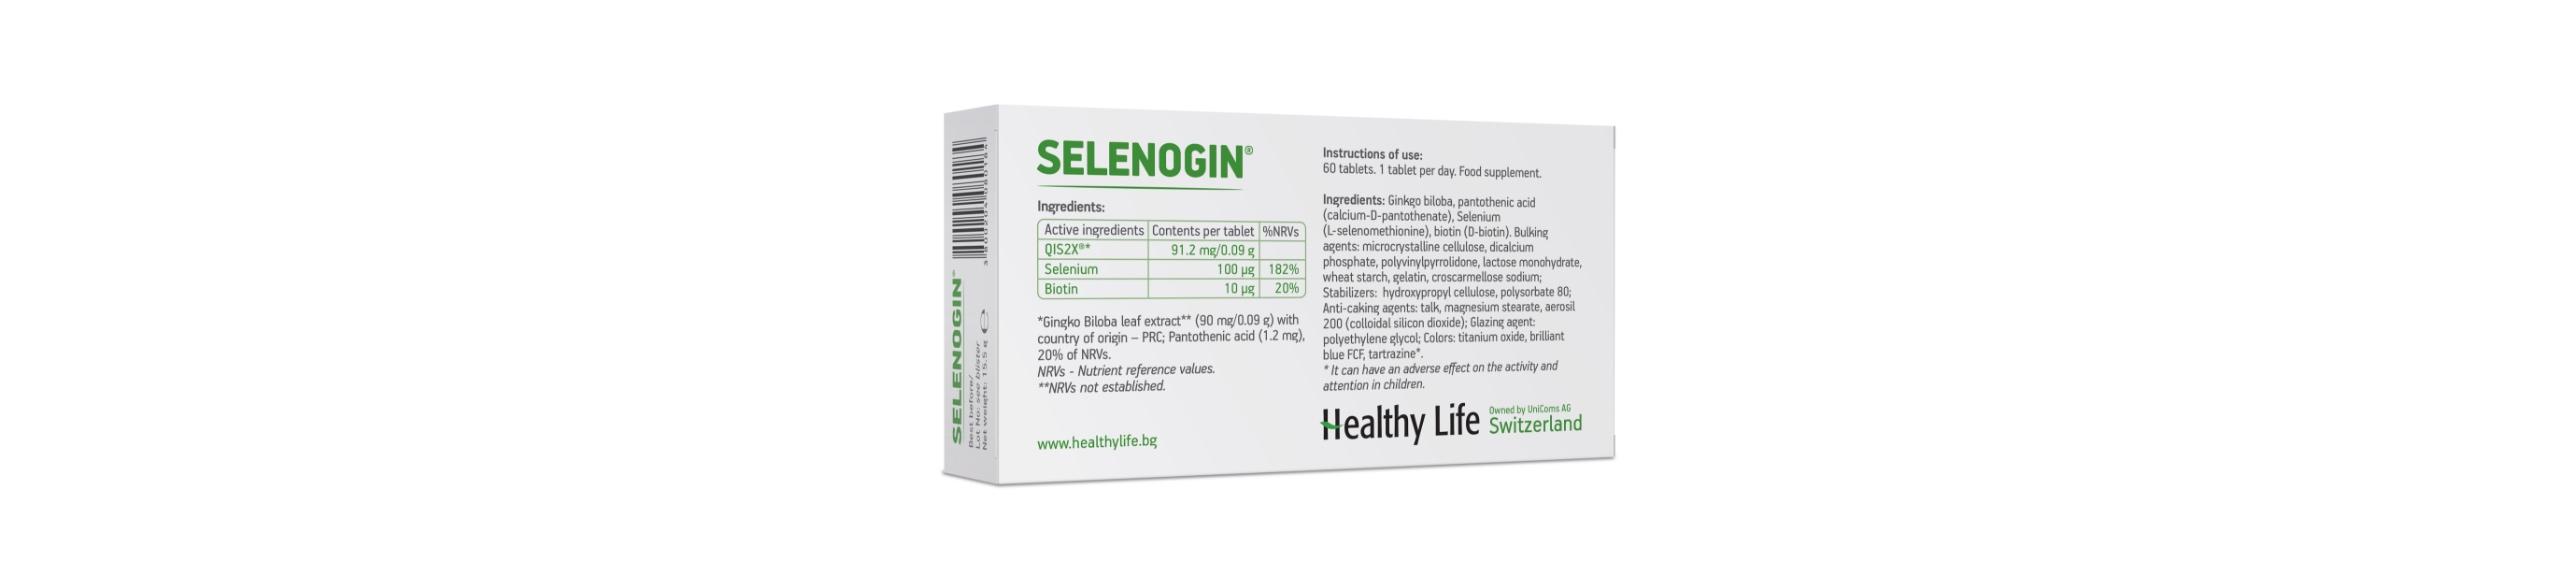 P3-Slider-img-Selenogin4